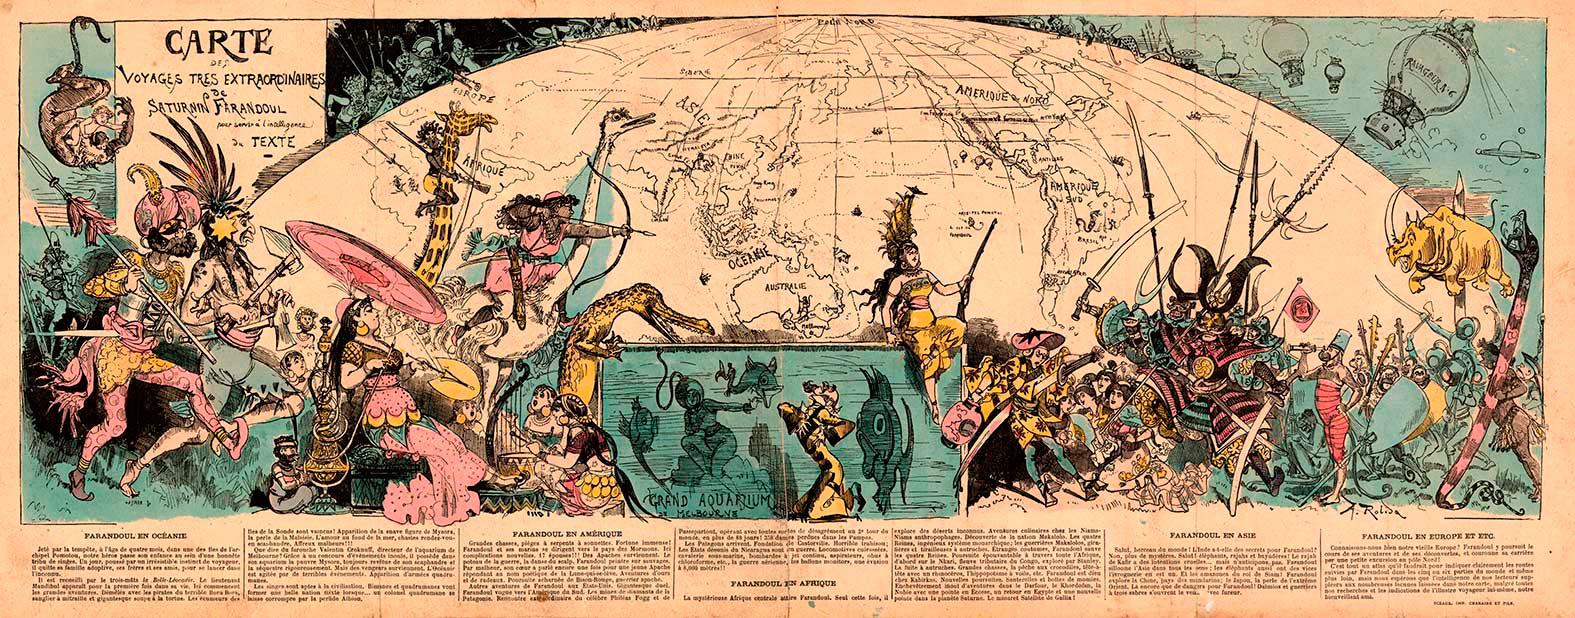 Albert-Robida_Carte-des-Voyages-très-Extraordinaires-Paris-1879